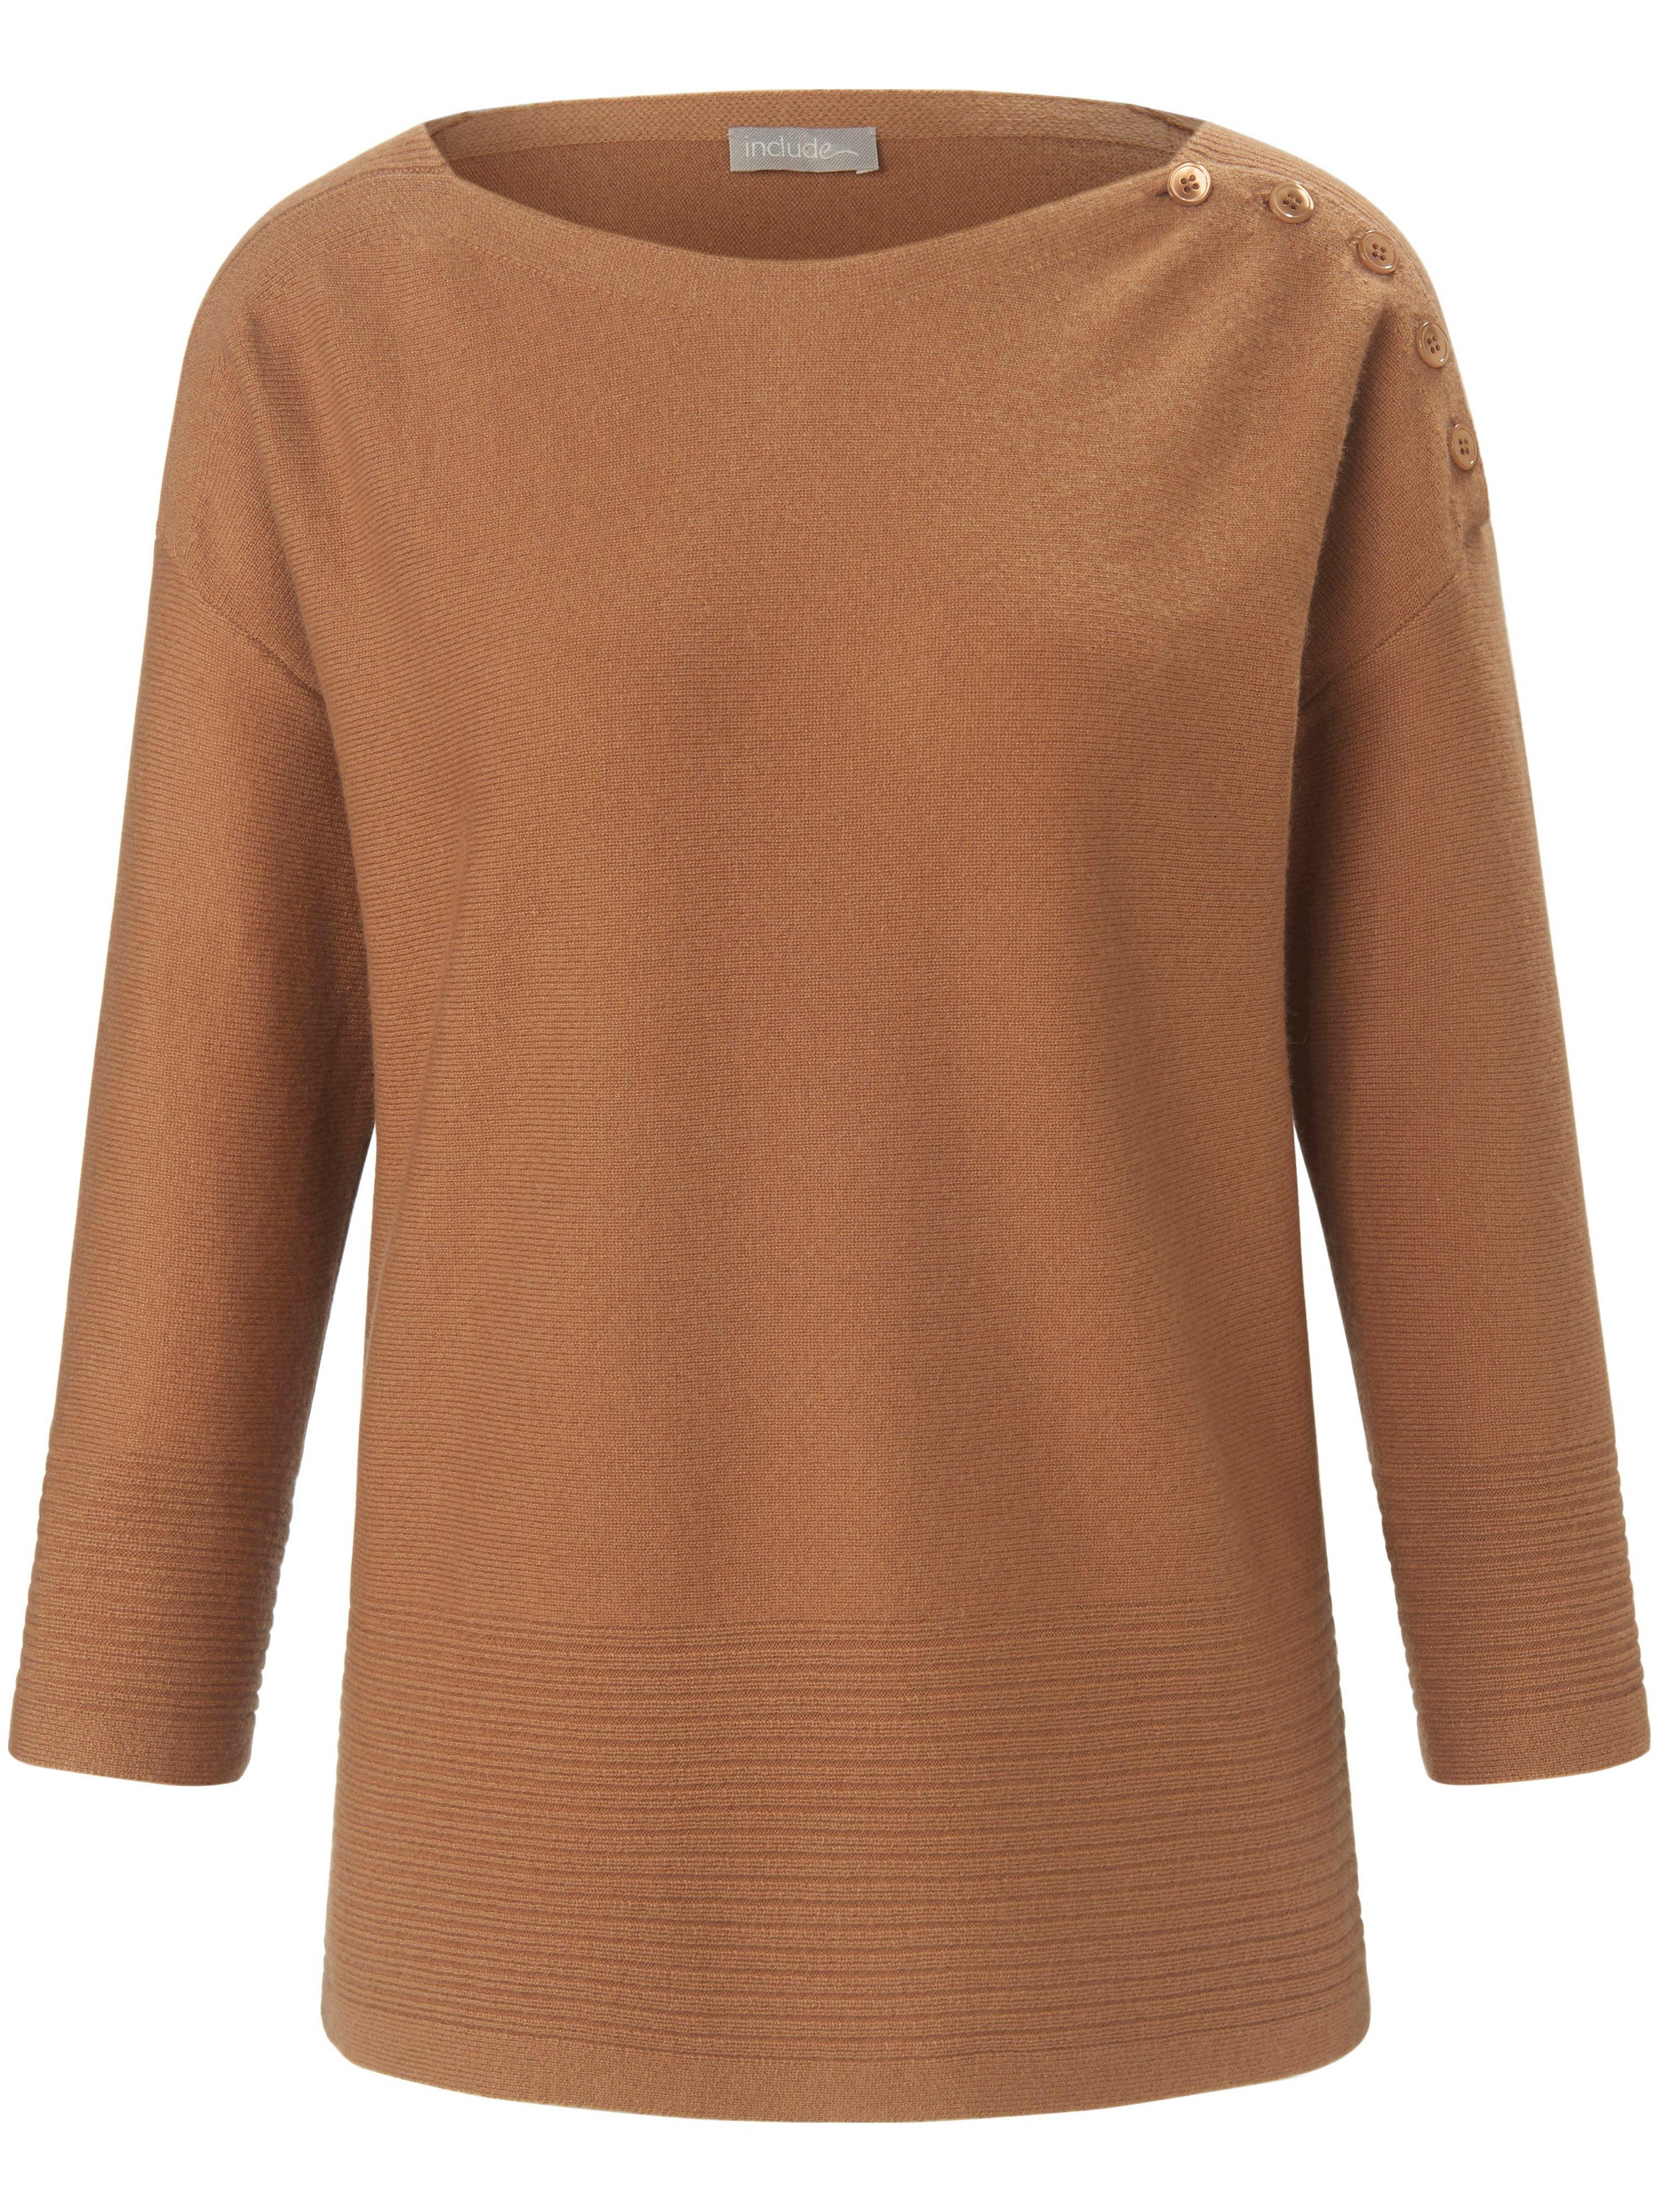 Jumper 3/4-length sleeves include brown